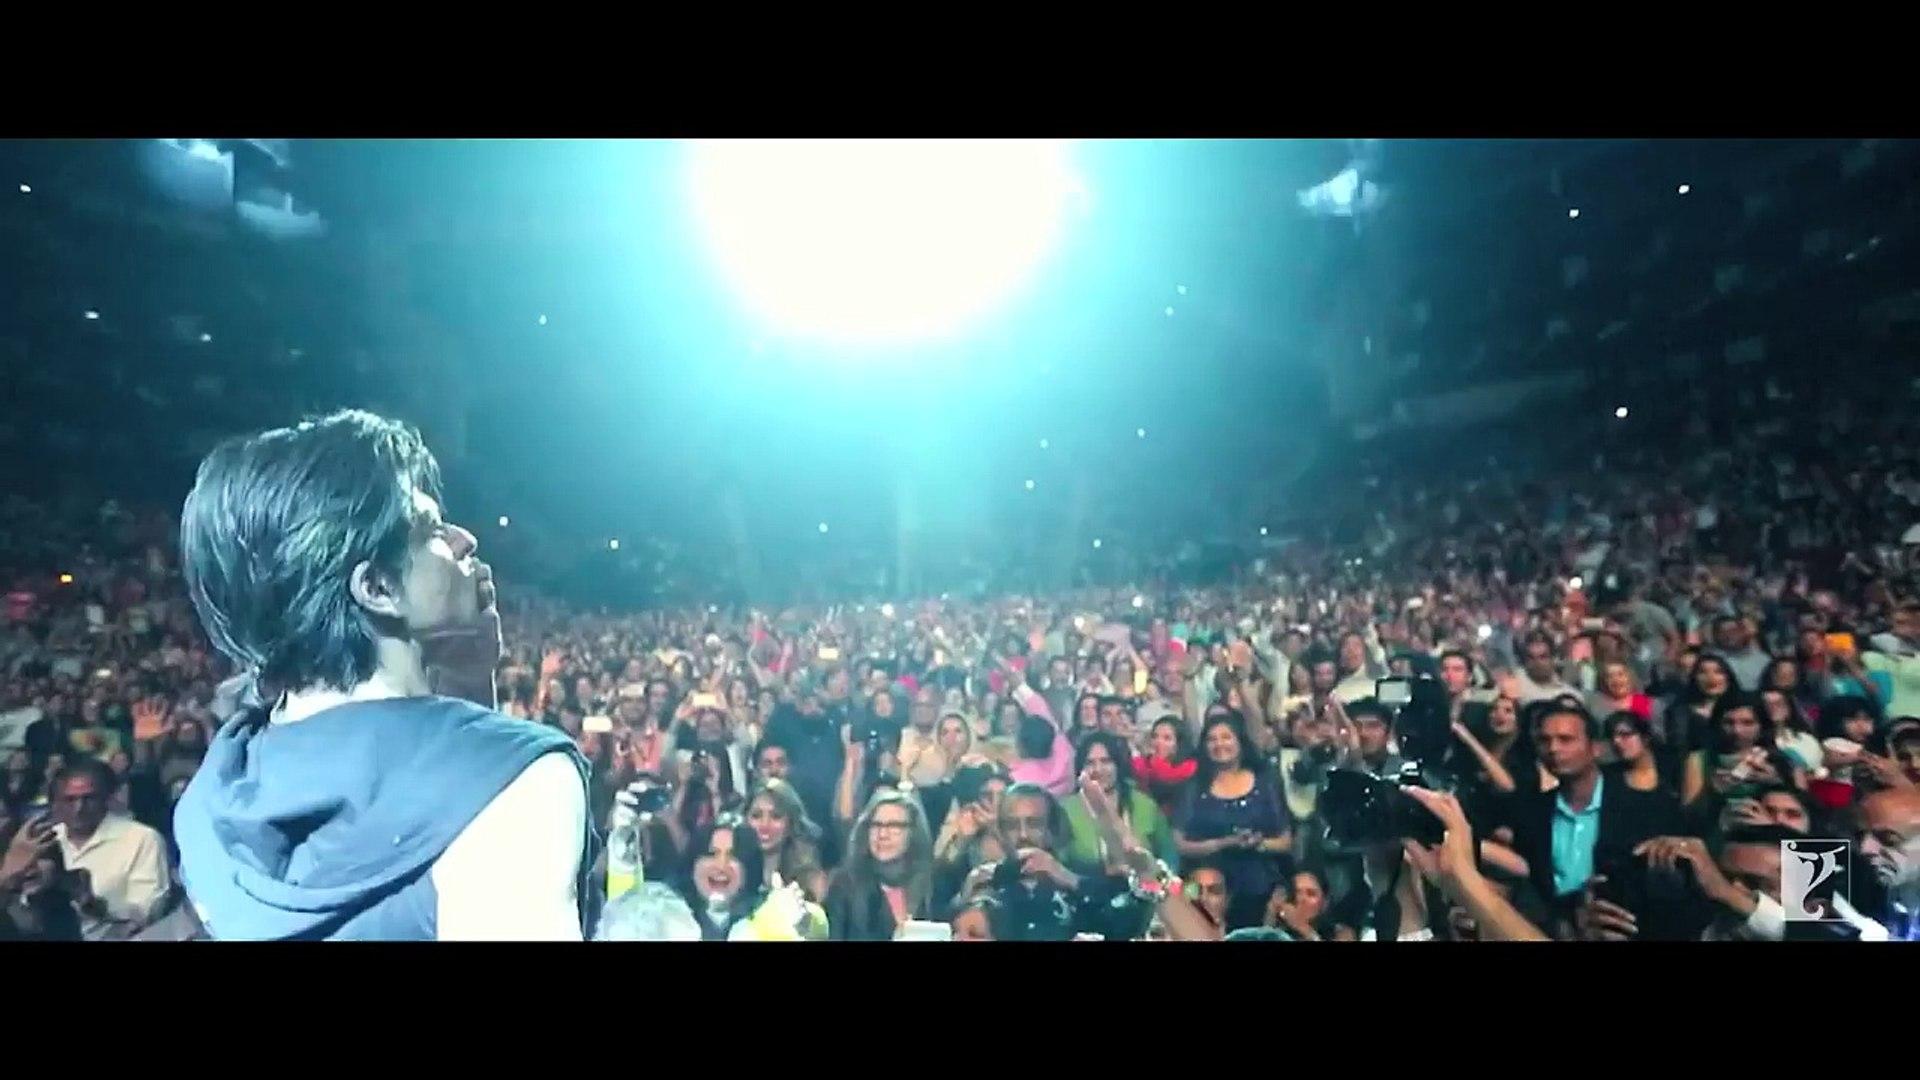 Fan (2016) Free Movie Stream - Shah Rukh Khan